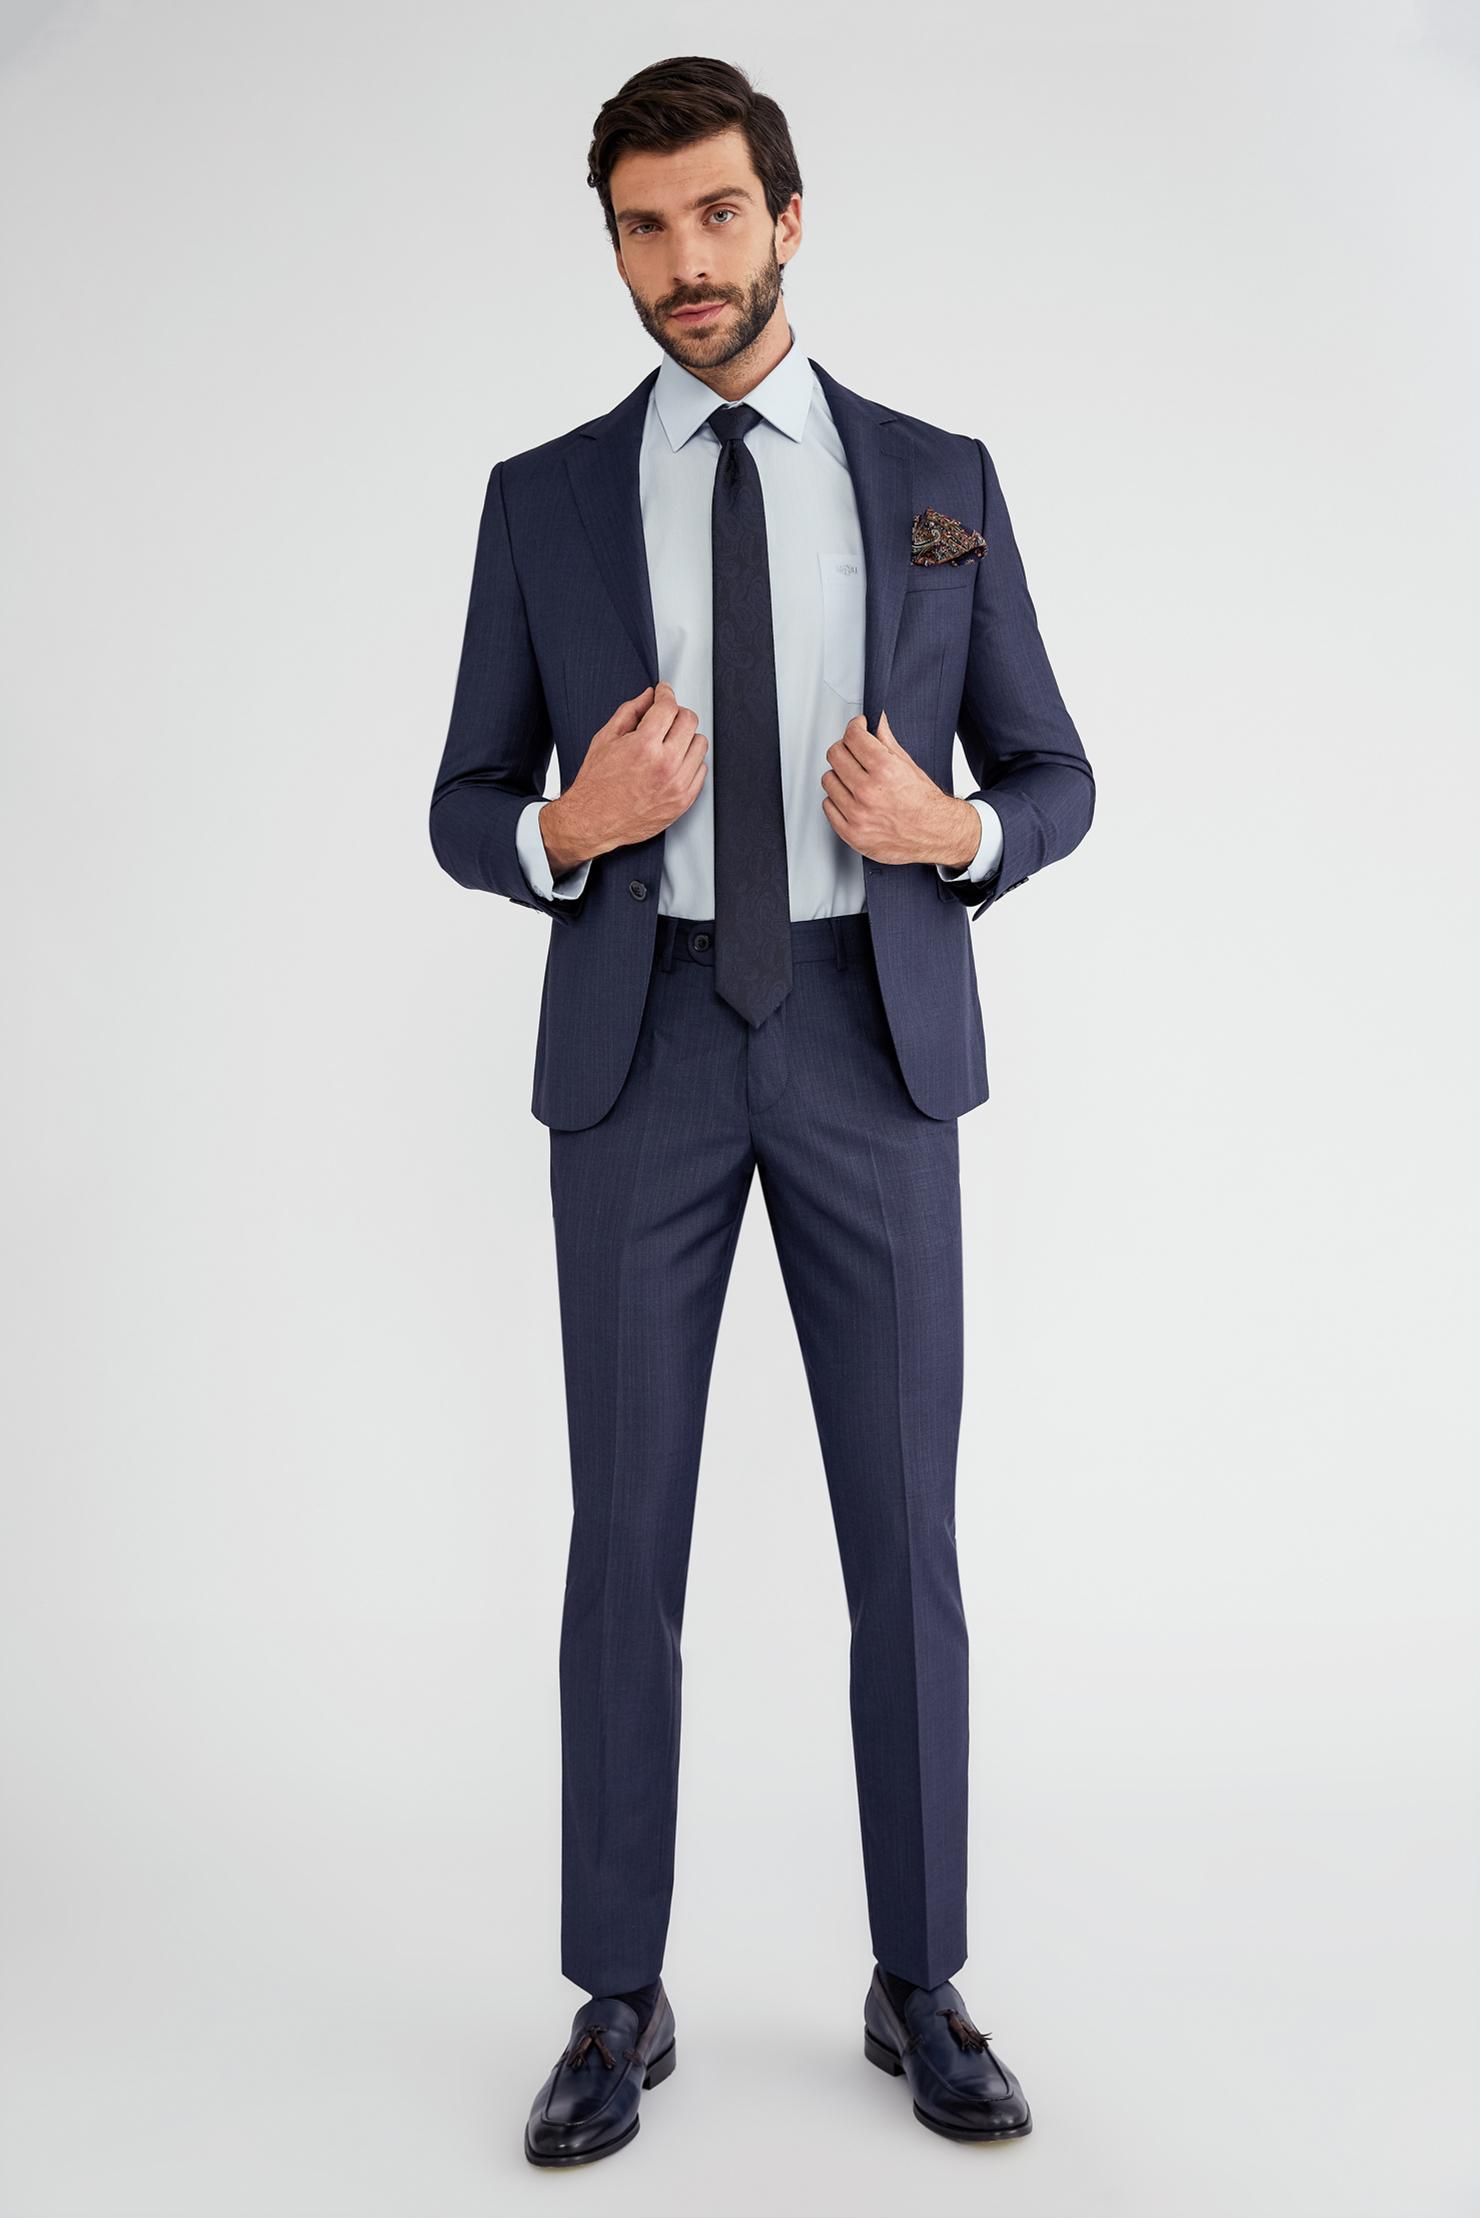 8631ffbcd15eb Slim Fit Takım Elbise - Takım Elbise Modelleri - Spor Takım Elbise